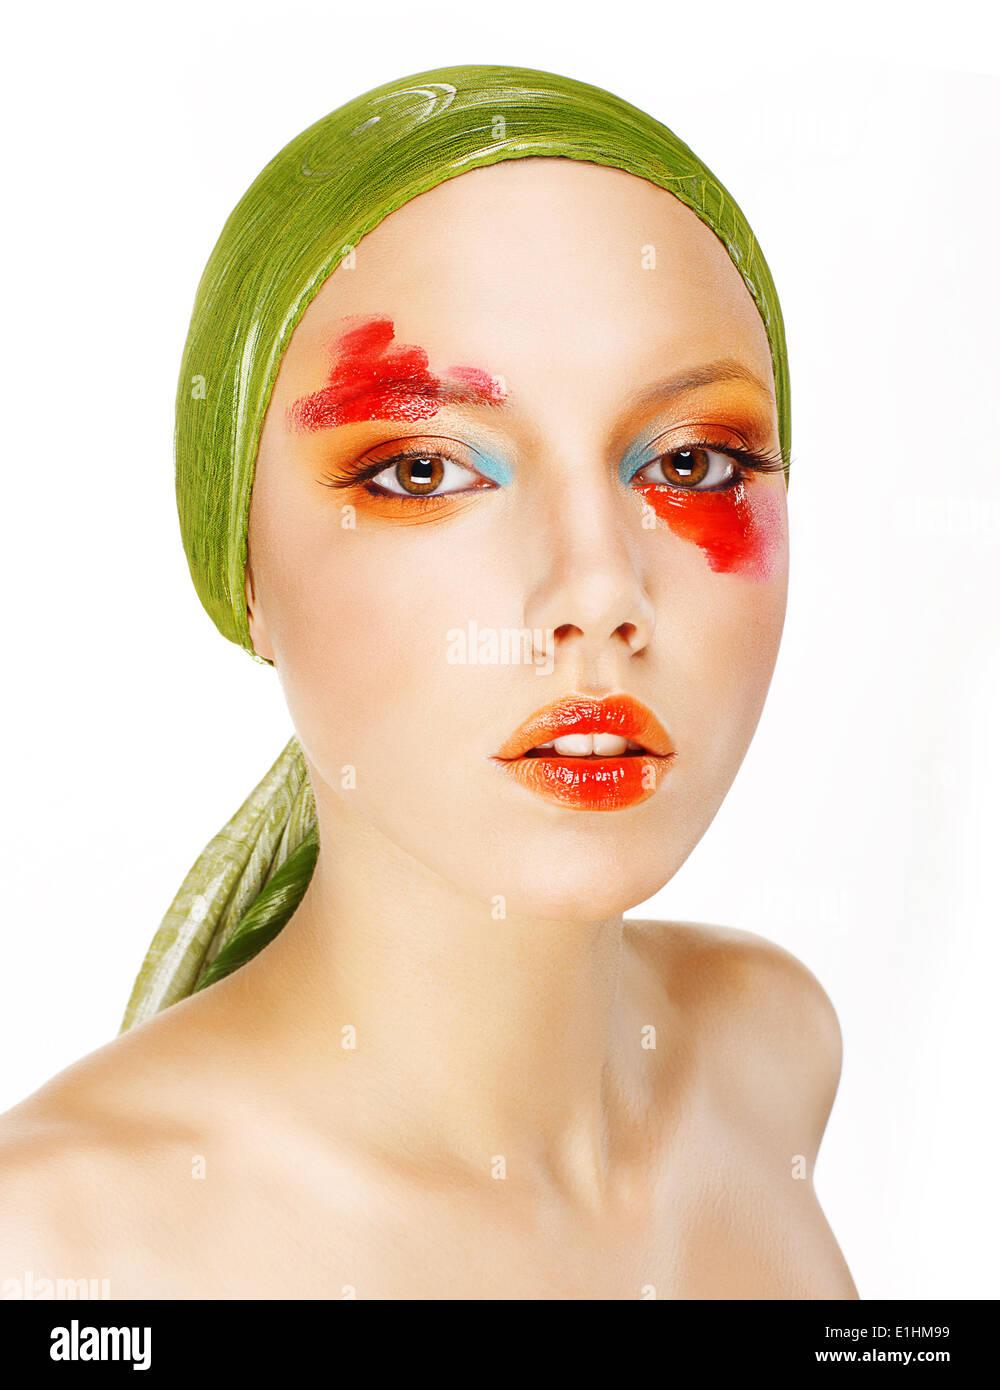 Fantasie. Glamour. Mode-Modell in grünen Schal und bunten Make-up Stockbild